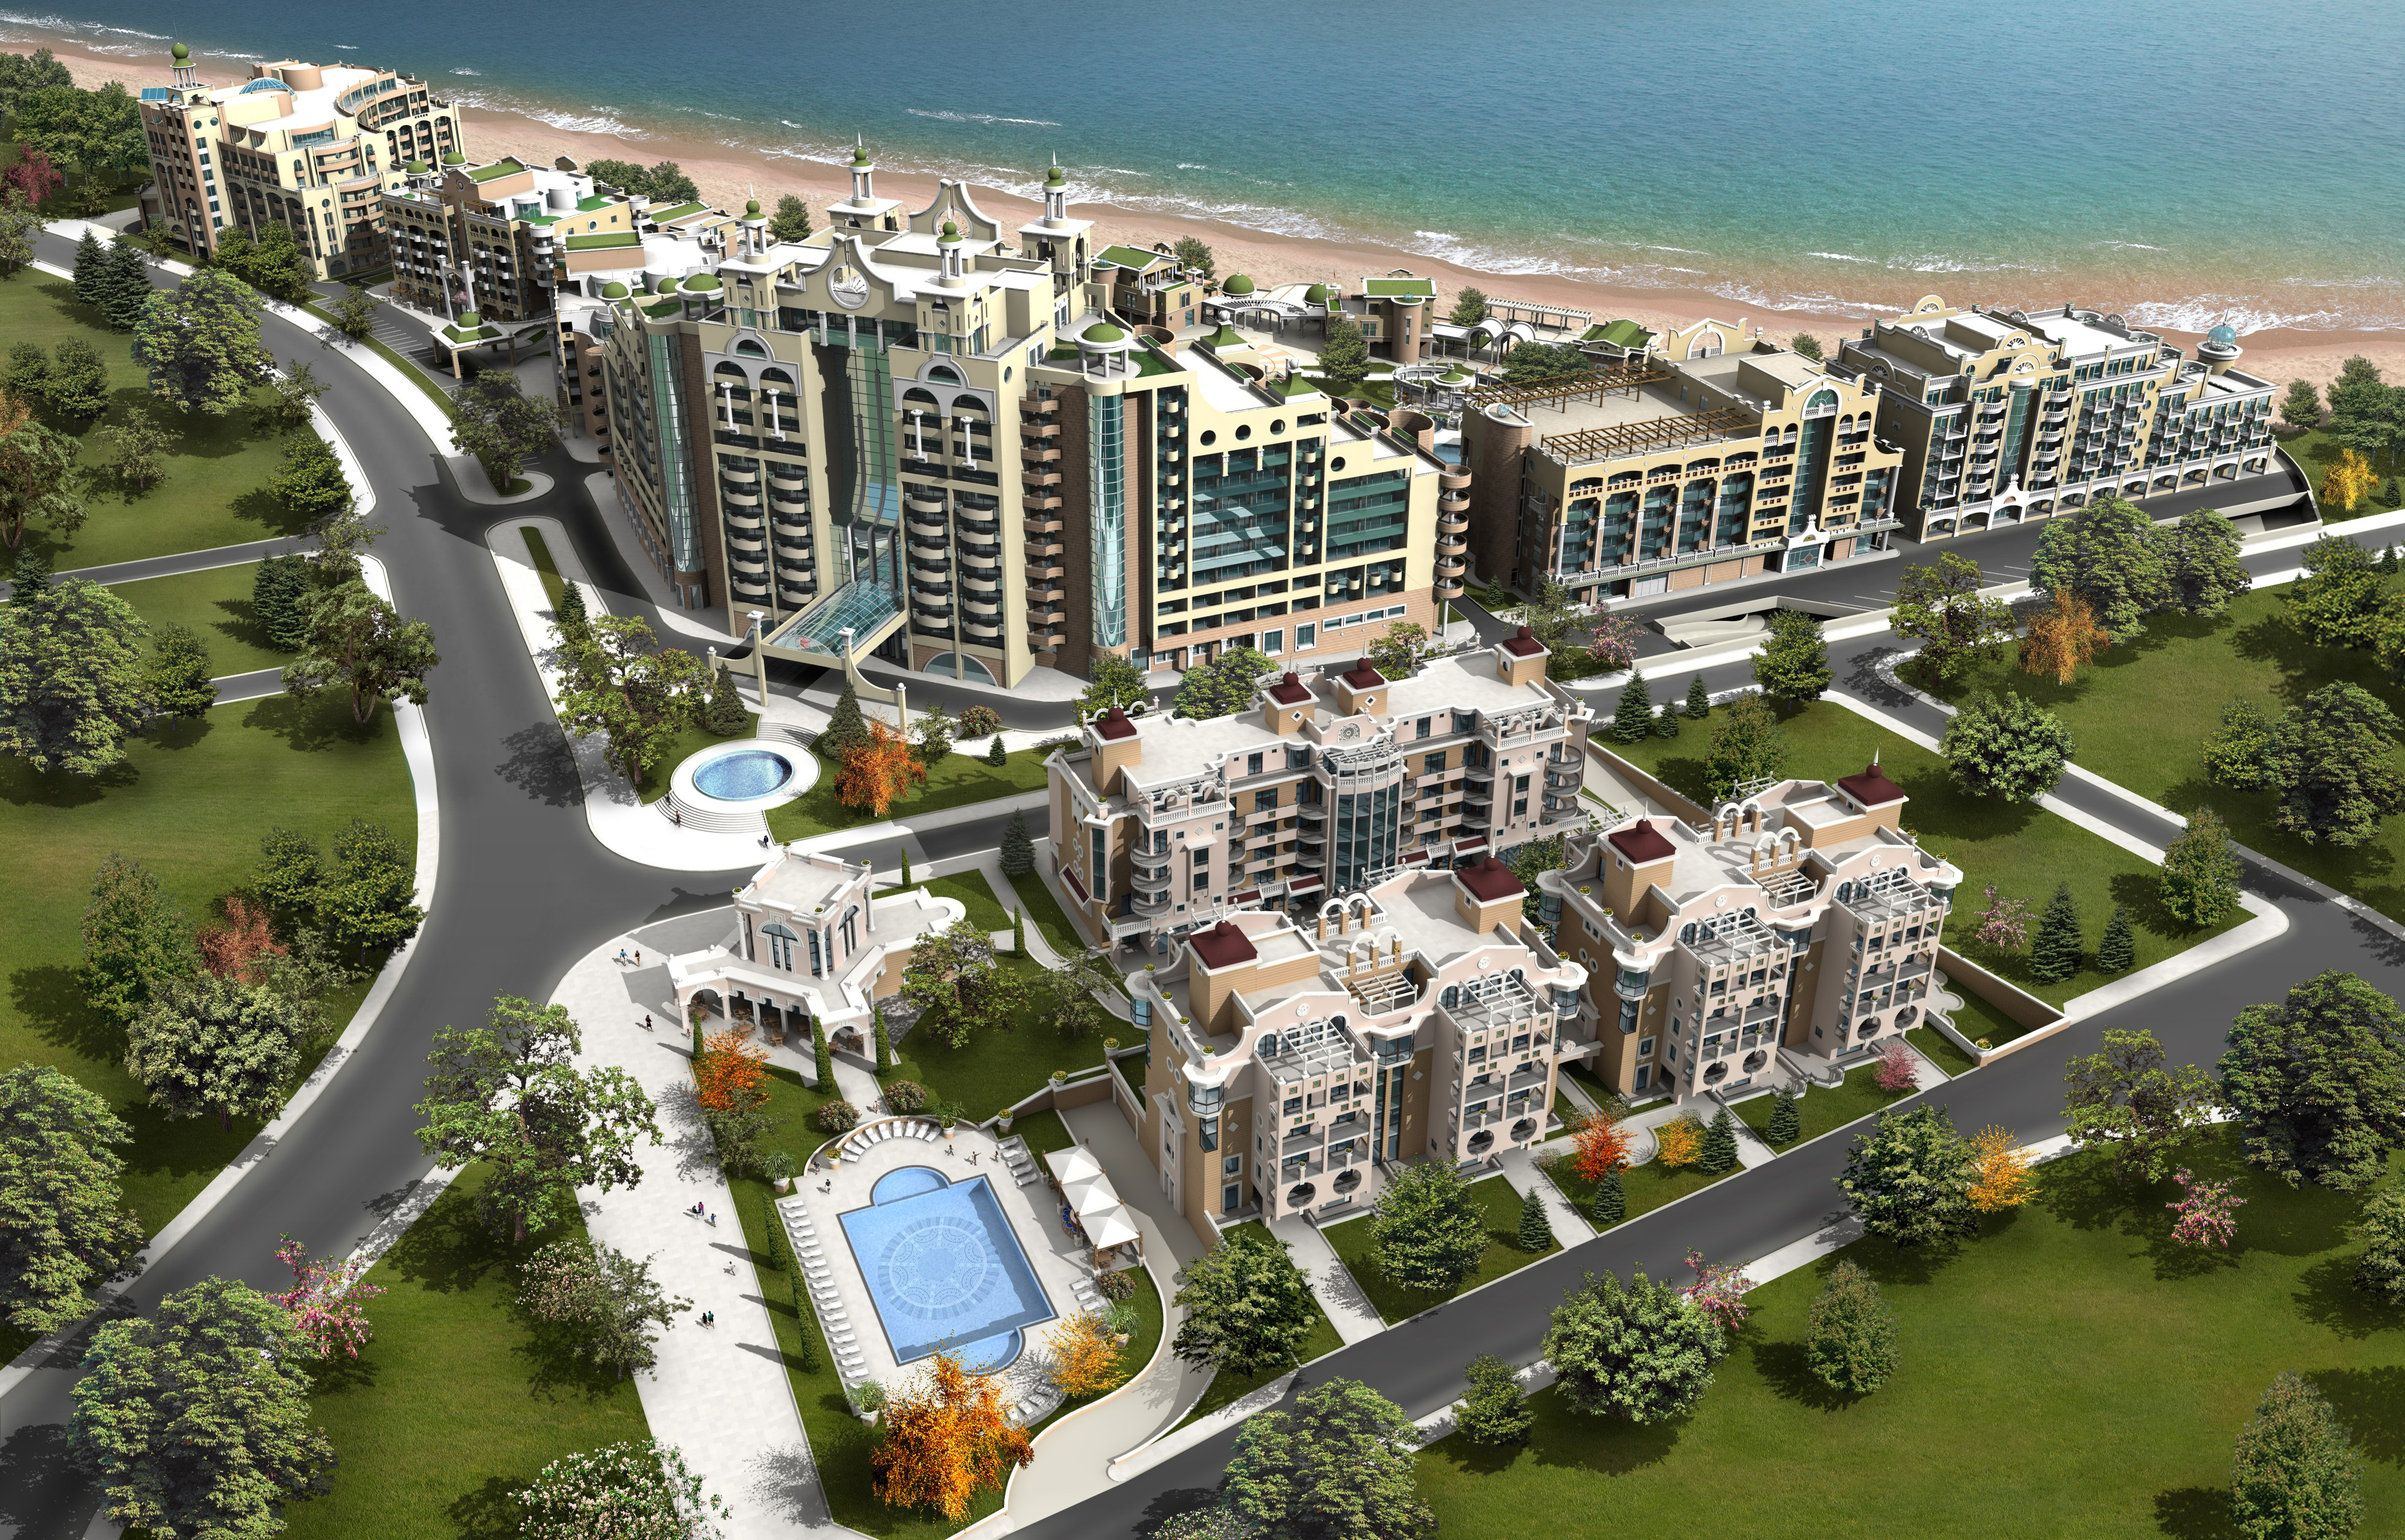 Sunset Resort Phase 2 Presented By Lngroup Management Ltd